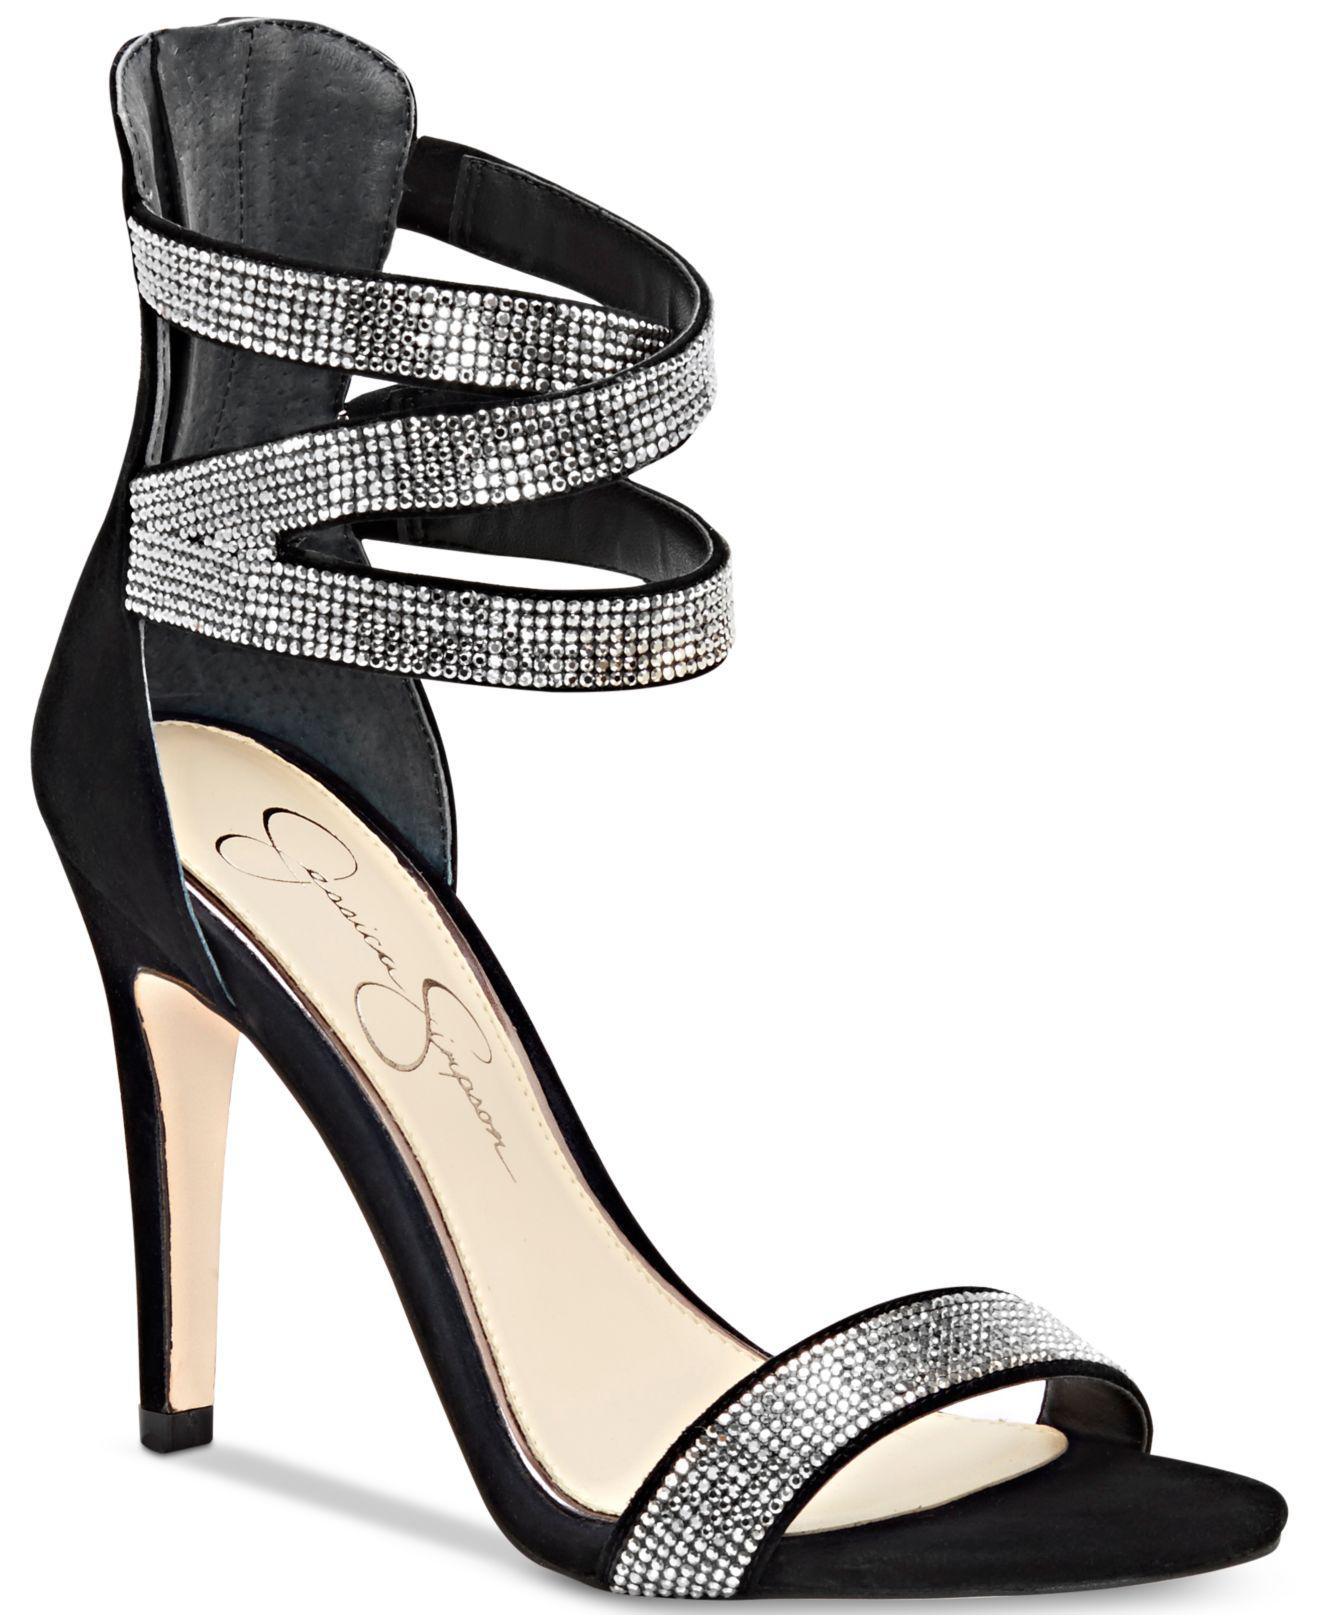 684b6545422 Lyst - Jessica Simpson Elepina Rhinestone Sandals in Black